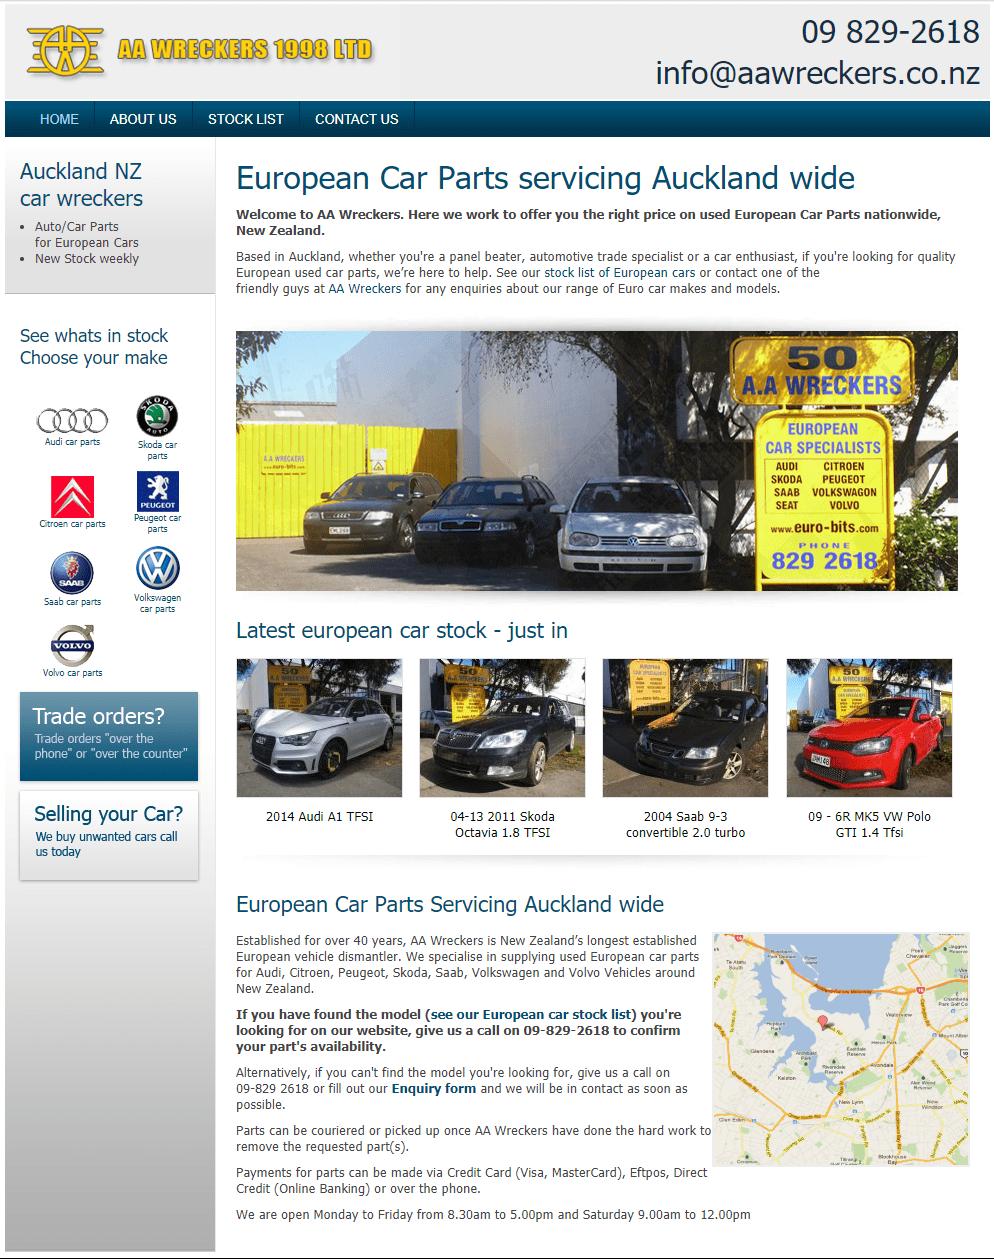 Original homepage screenshot